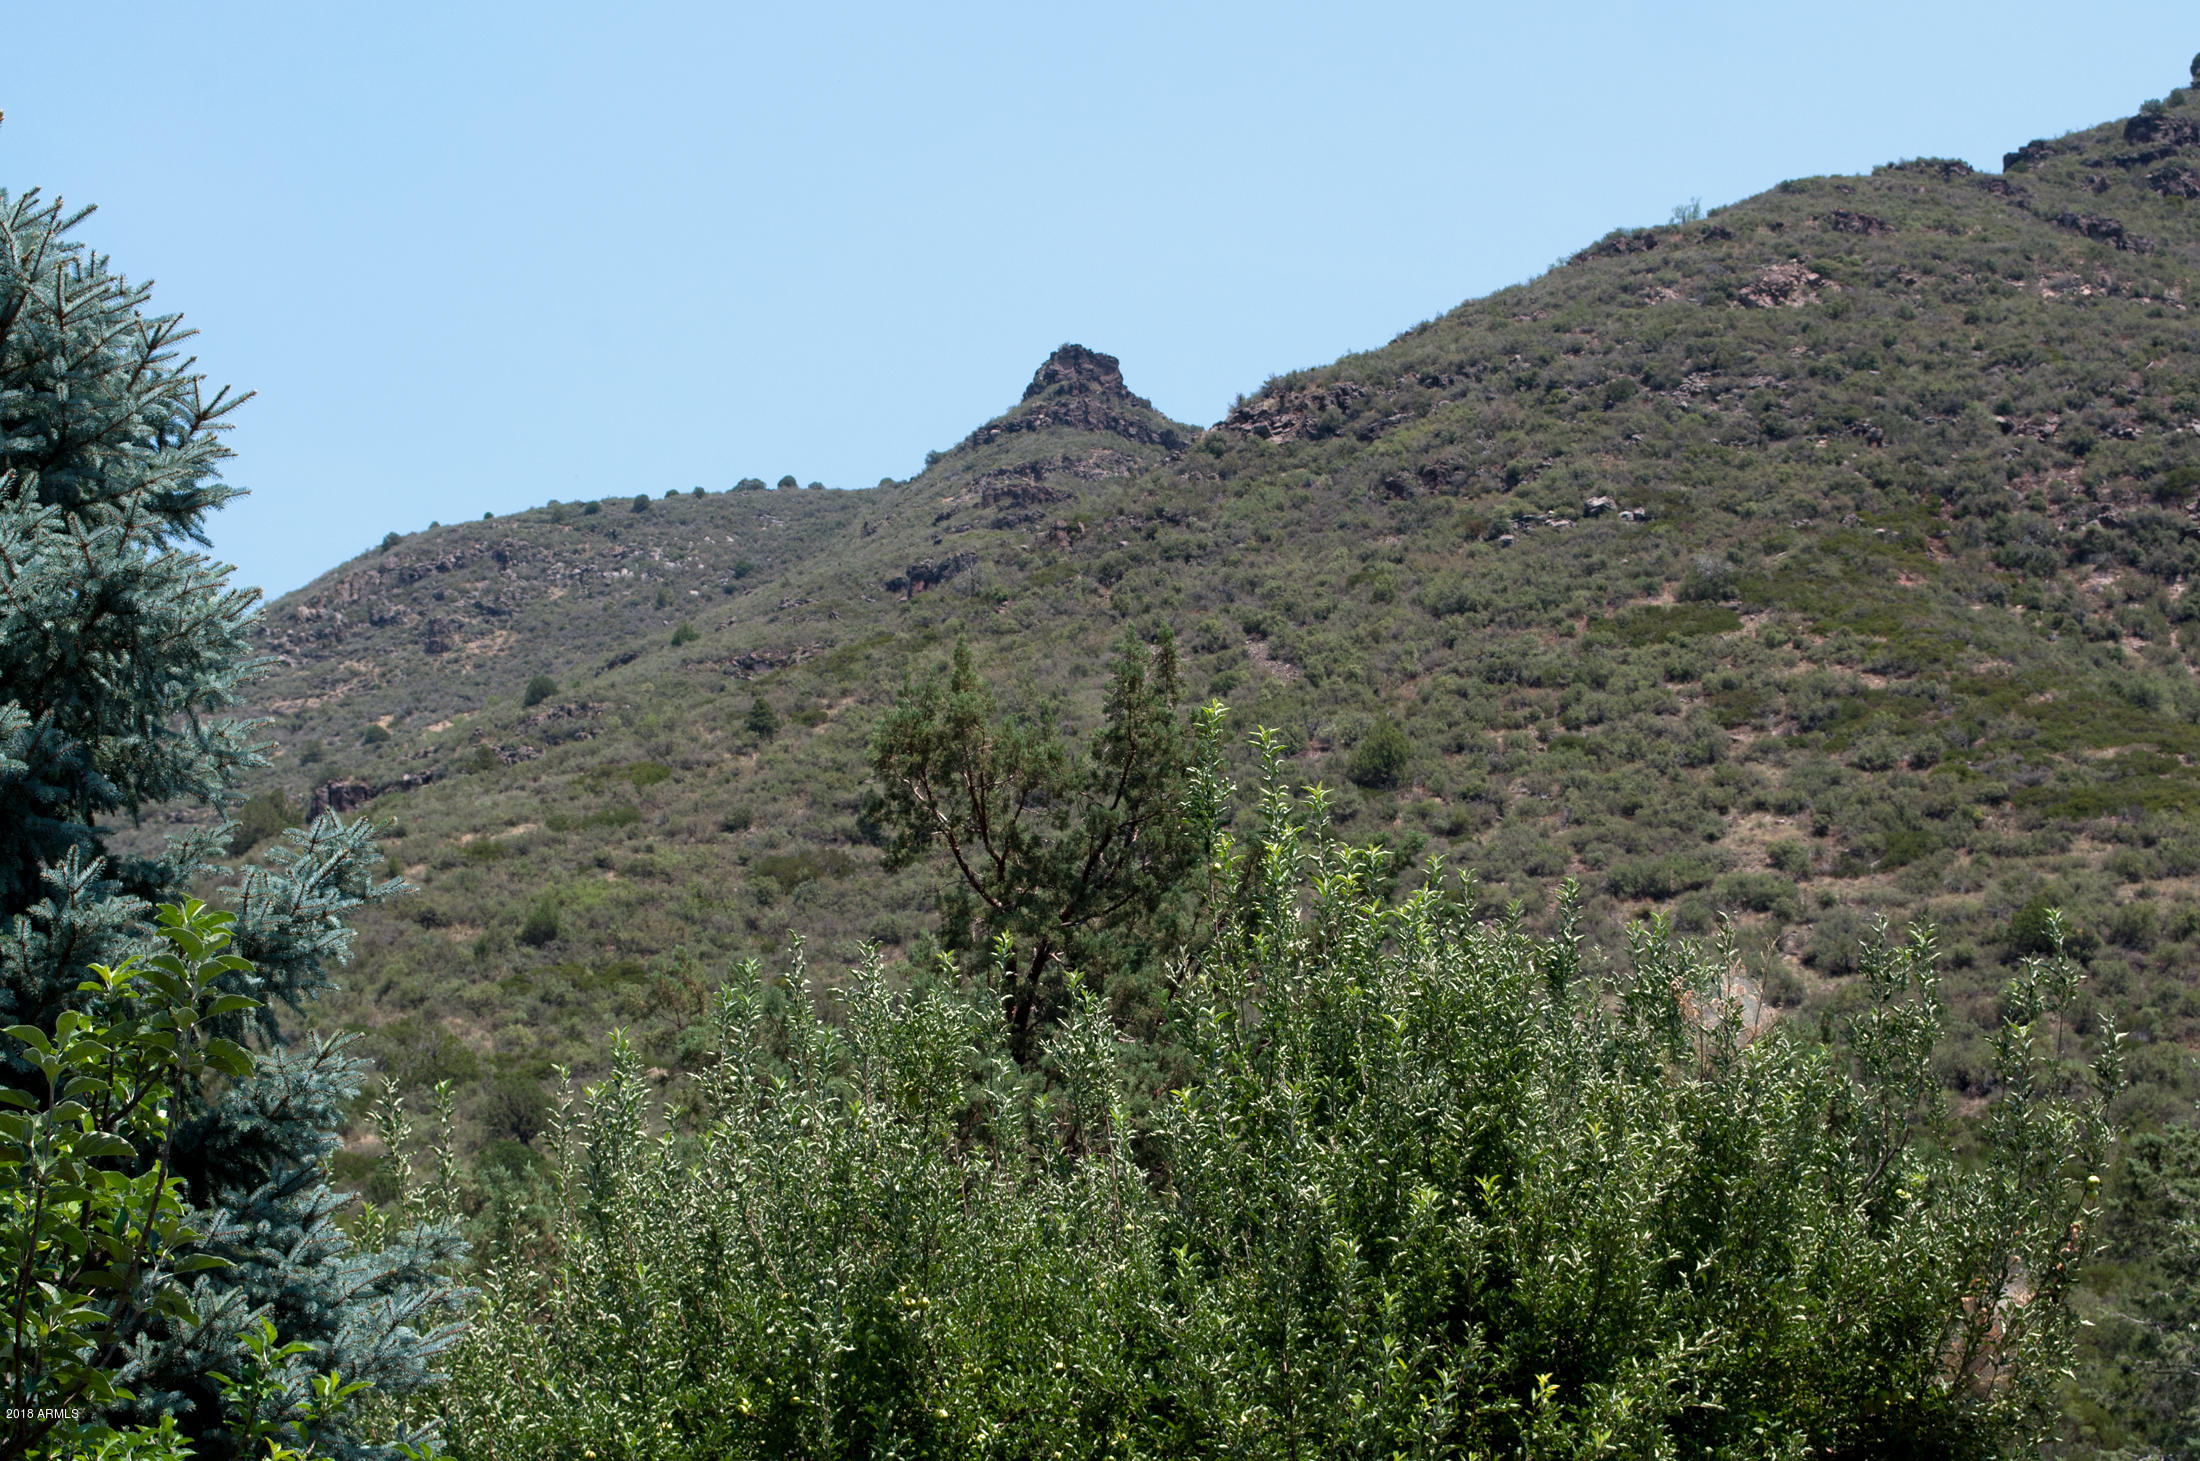 MLS 5852055 652 STAGGS LOOP Drive, Sedona, AZ Sedona AZ